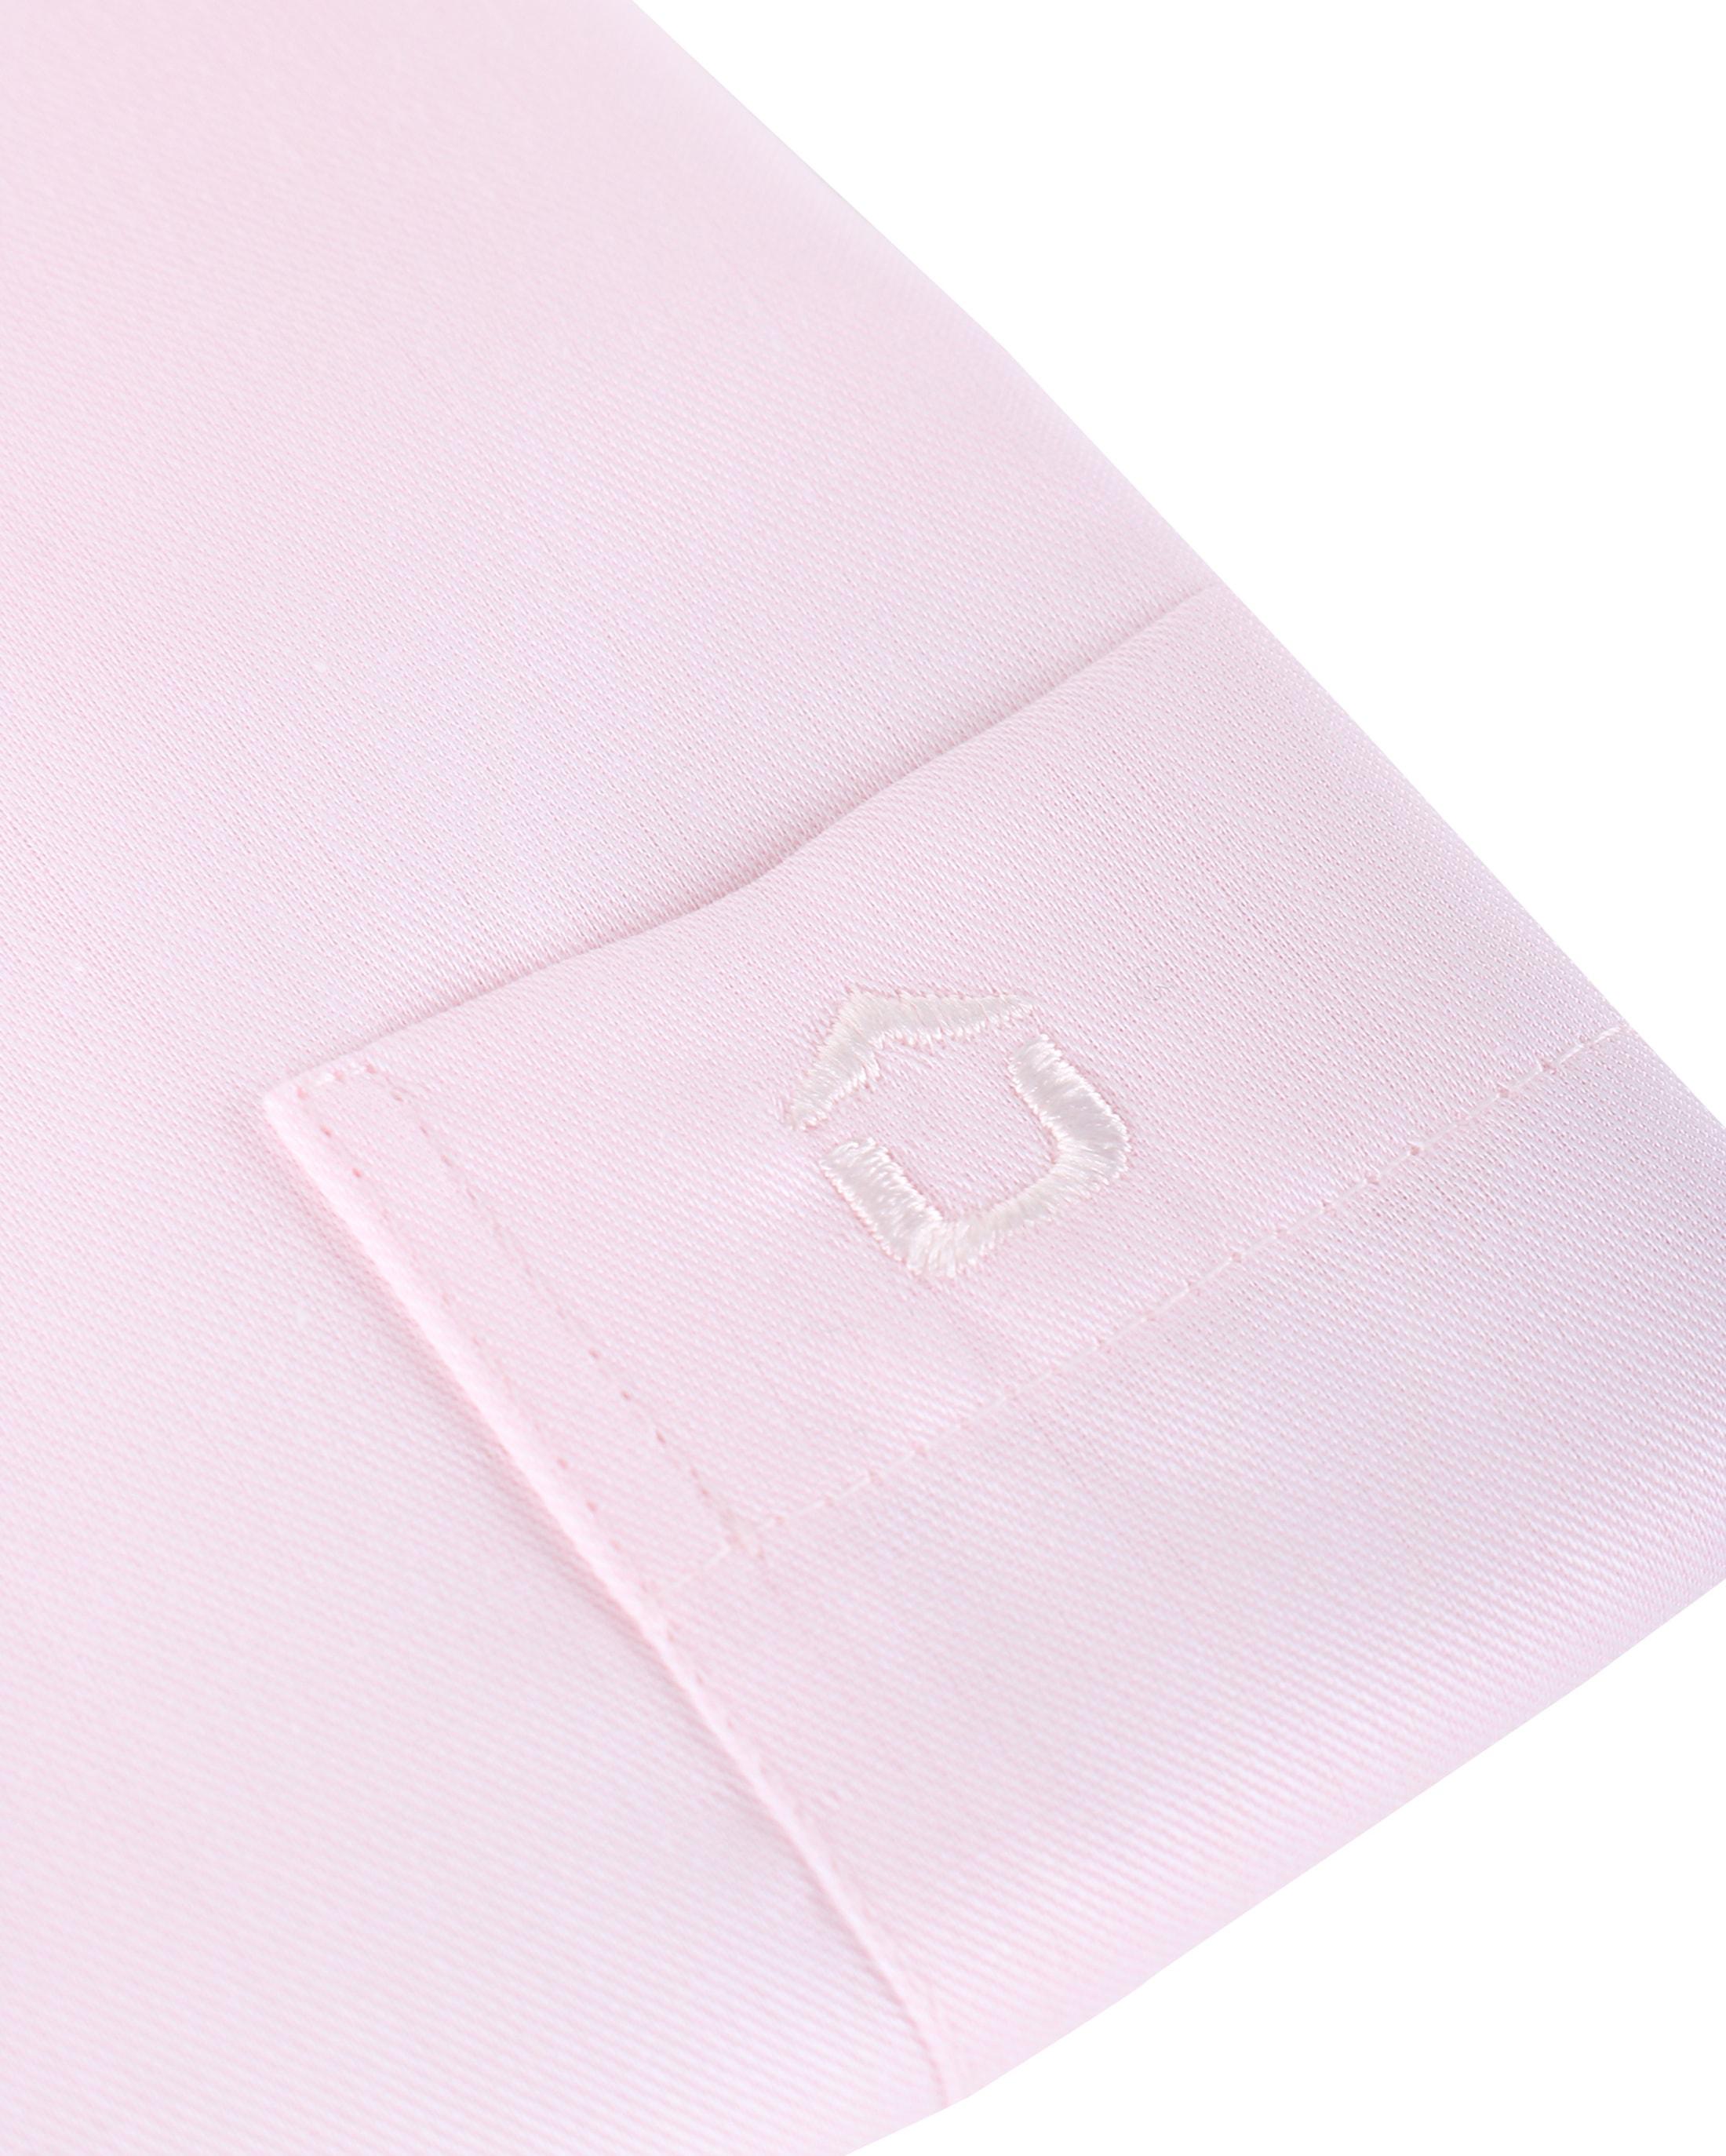 Ledub Overhemd Roze Non Iron foto 2